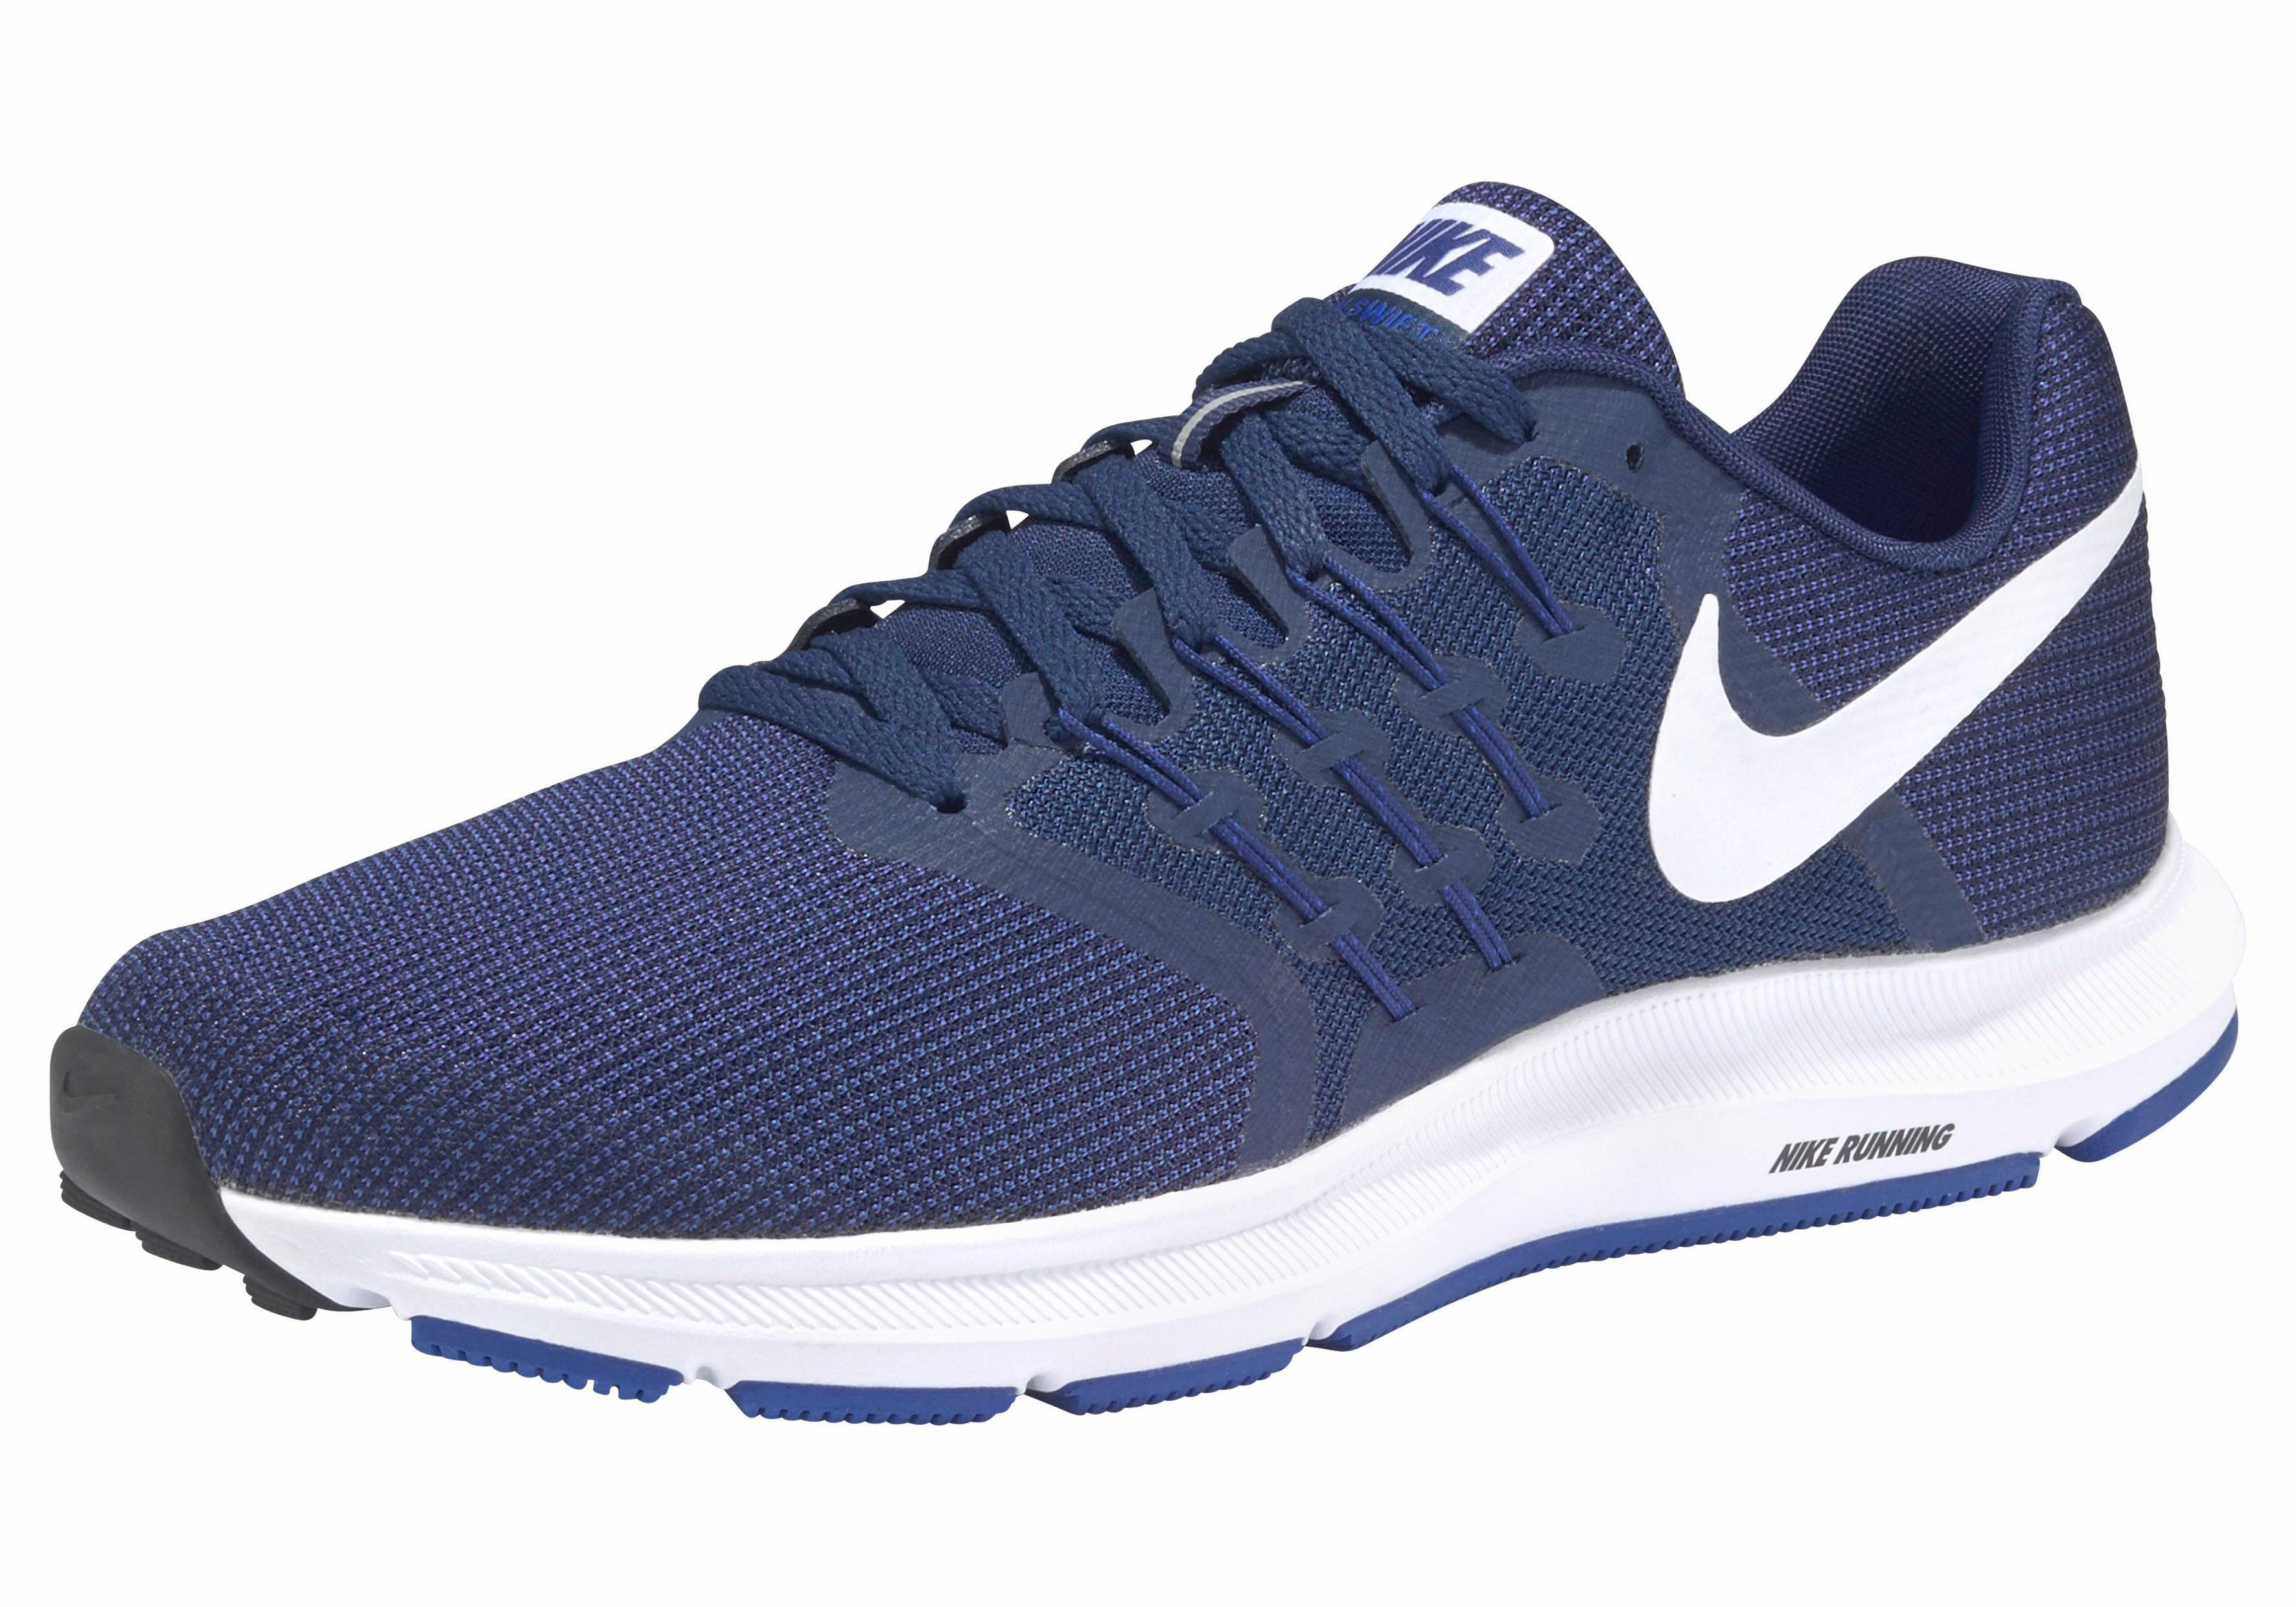 Nike »Run Swift« Laufschuh, Atmungsaktives Obermaterial aus Mesh online kaufen | OTTO